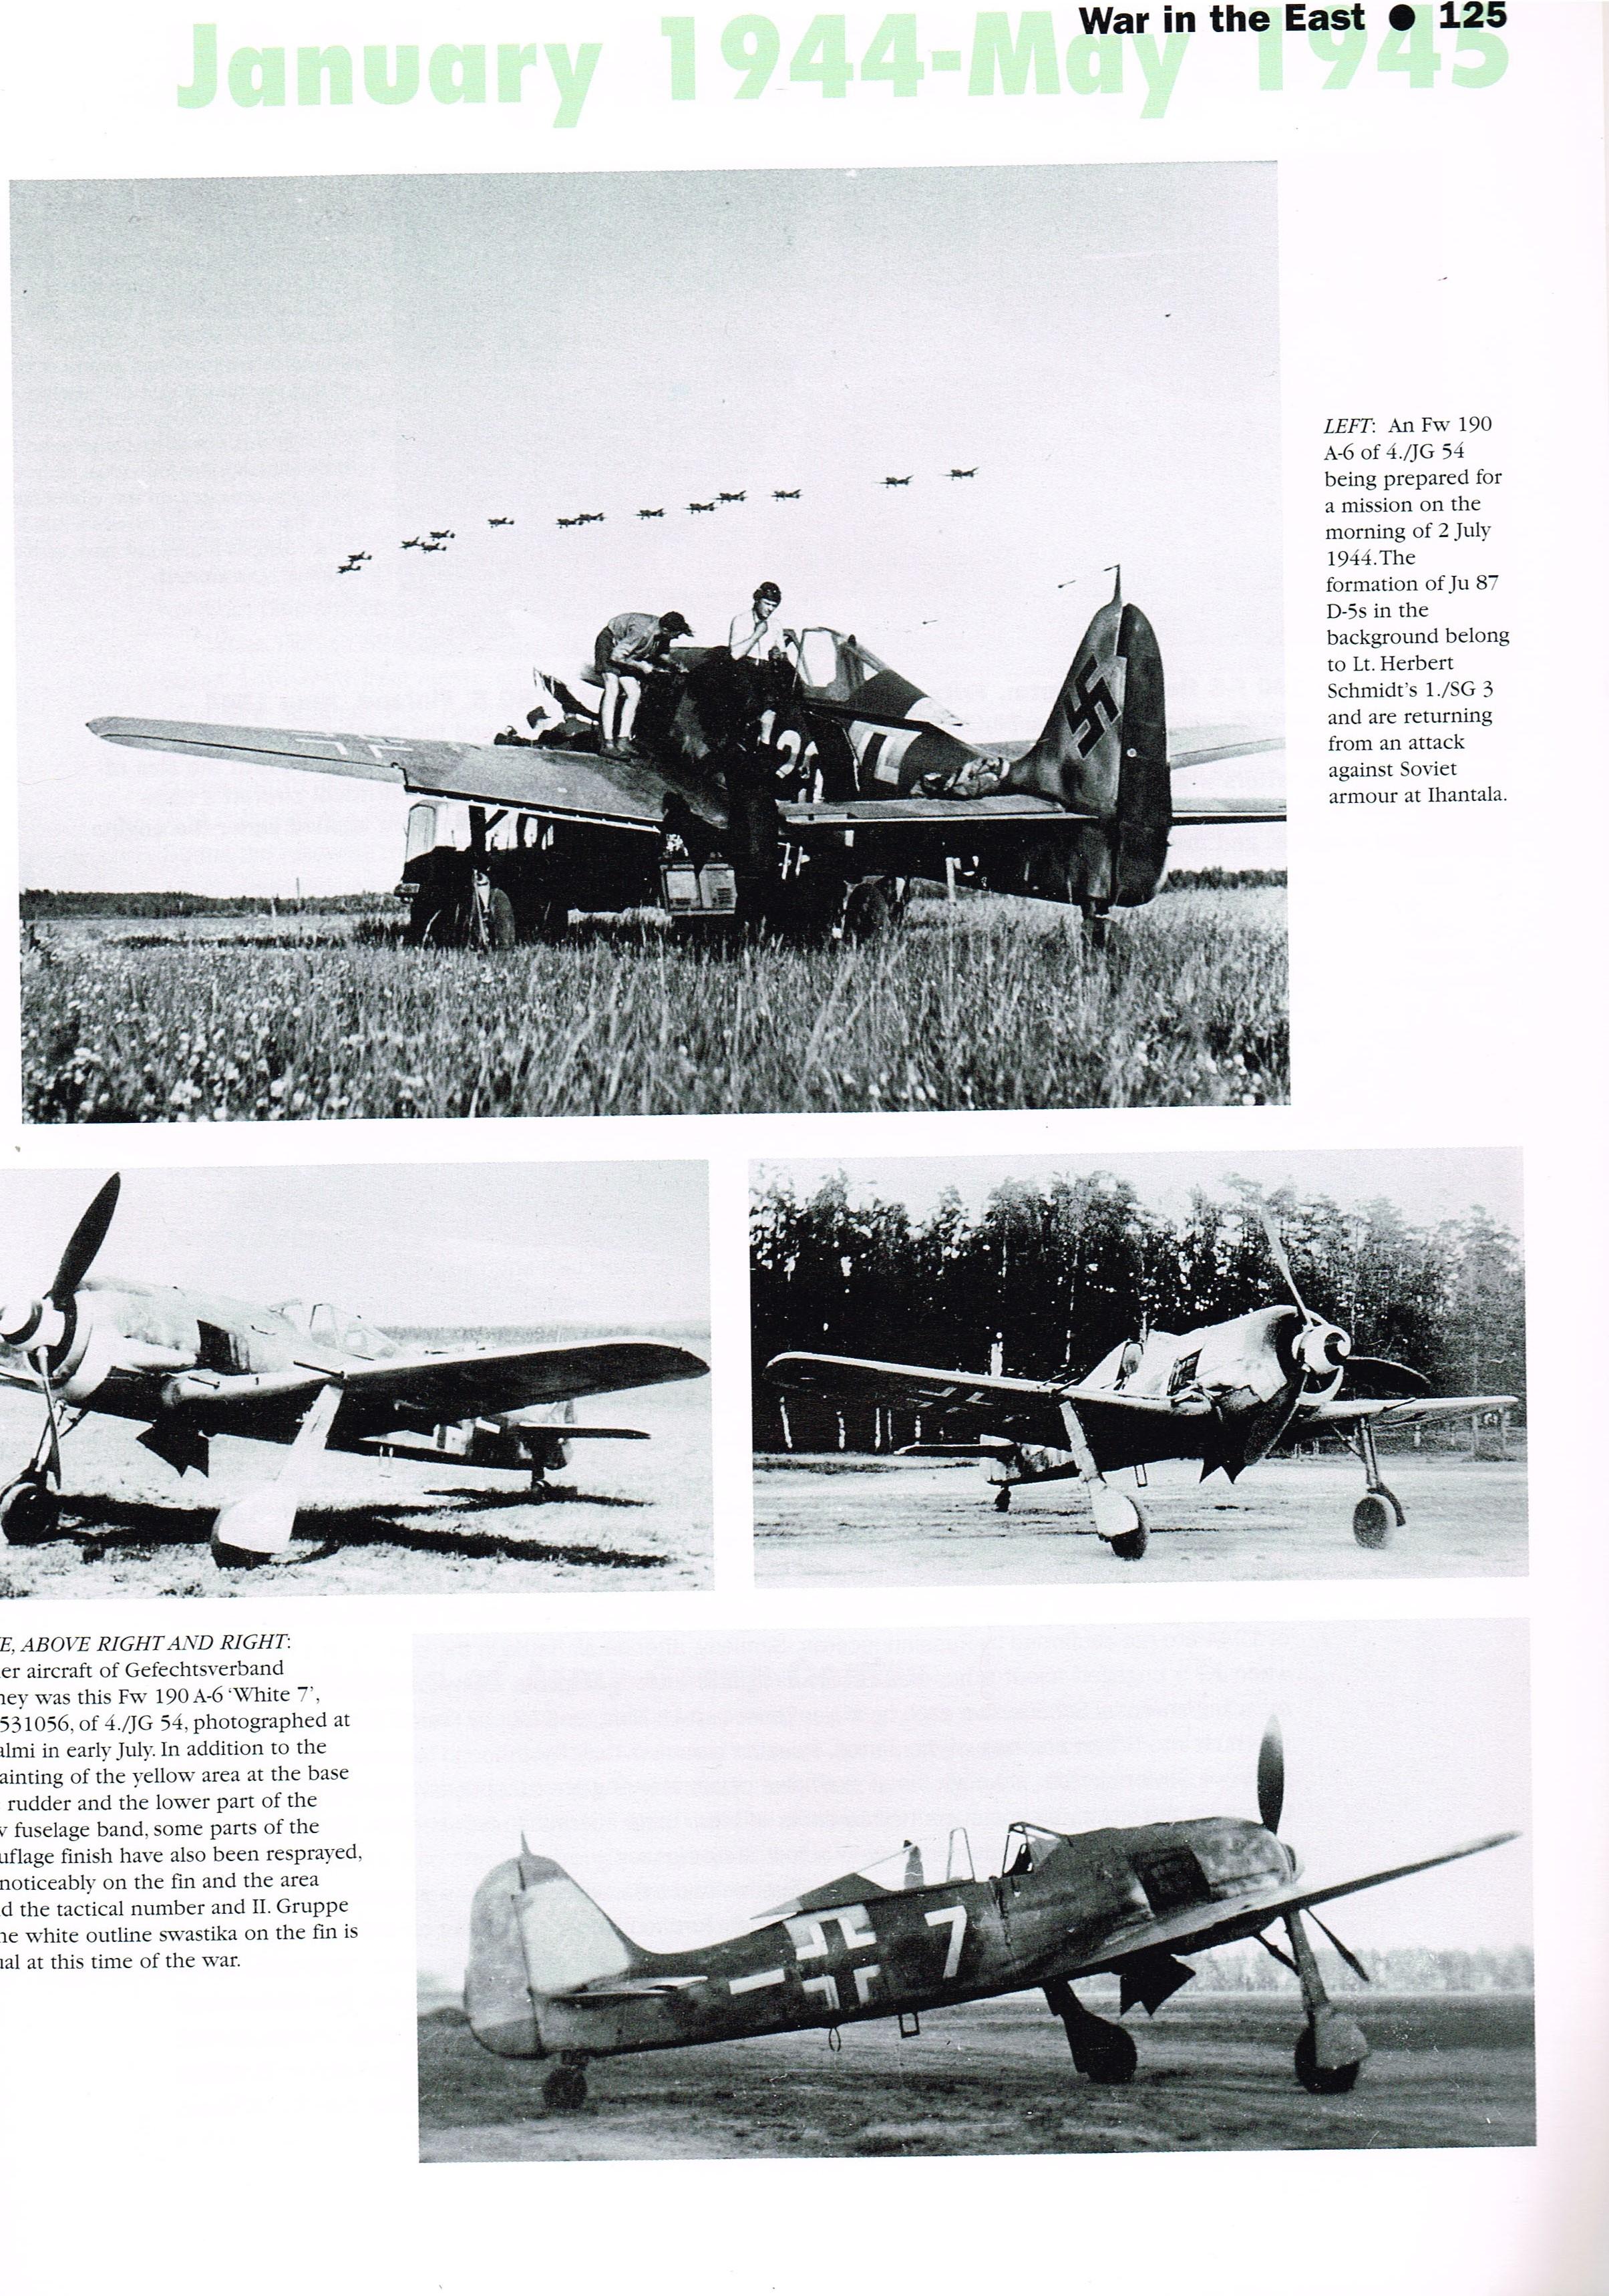 REF-0-A-6-W-Nr-531056-4-JG-54-Weiss-7-Ma